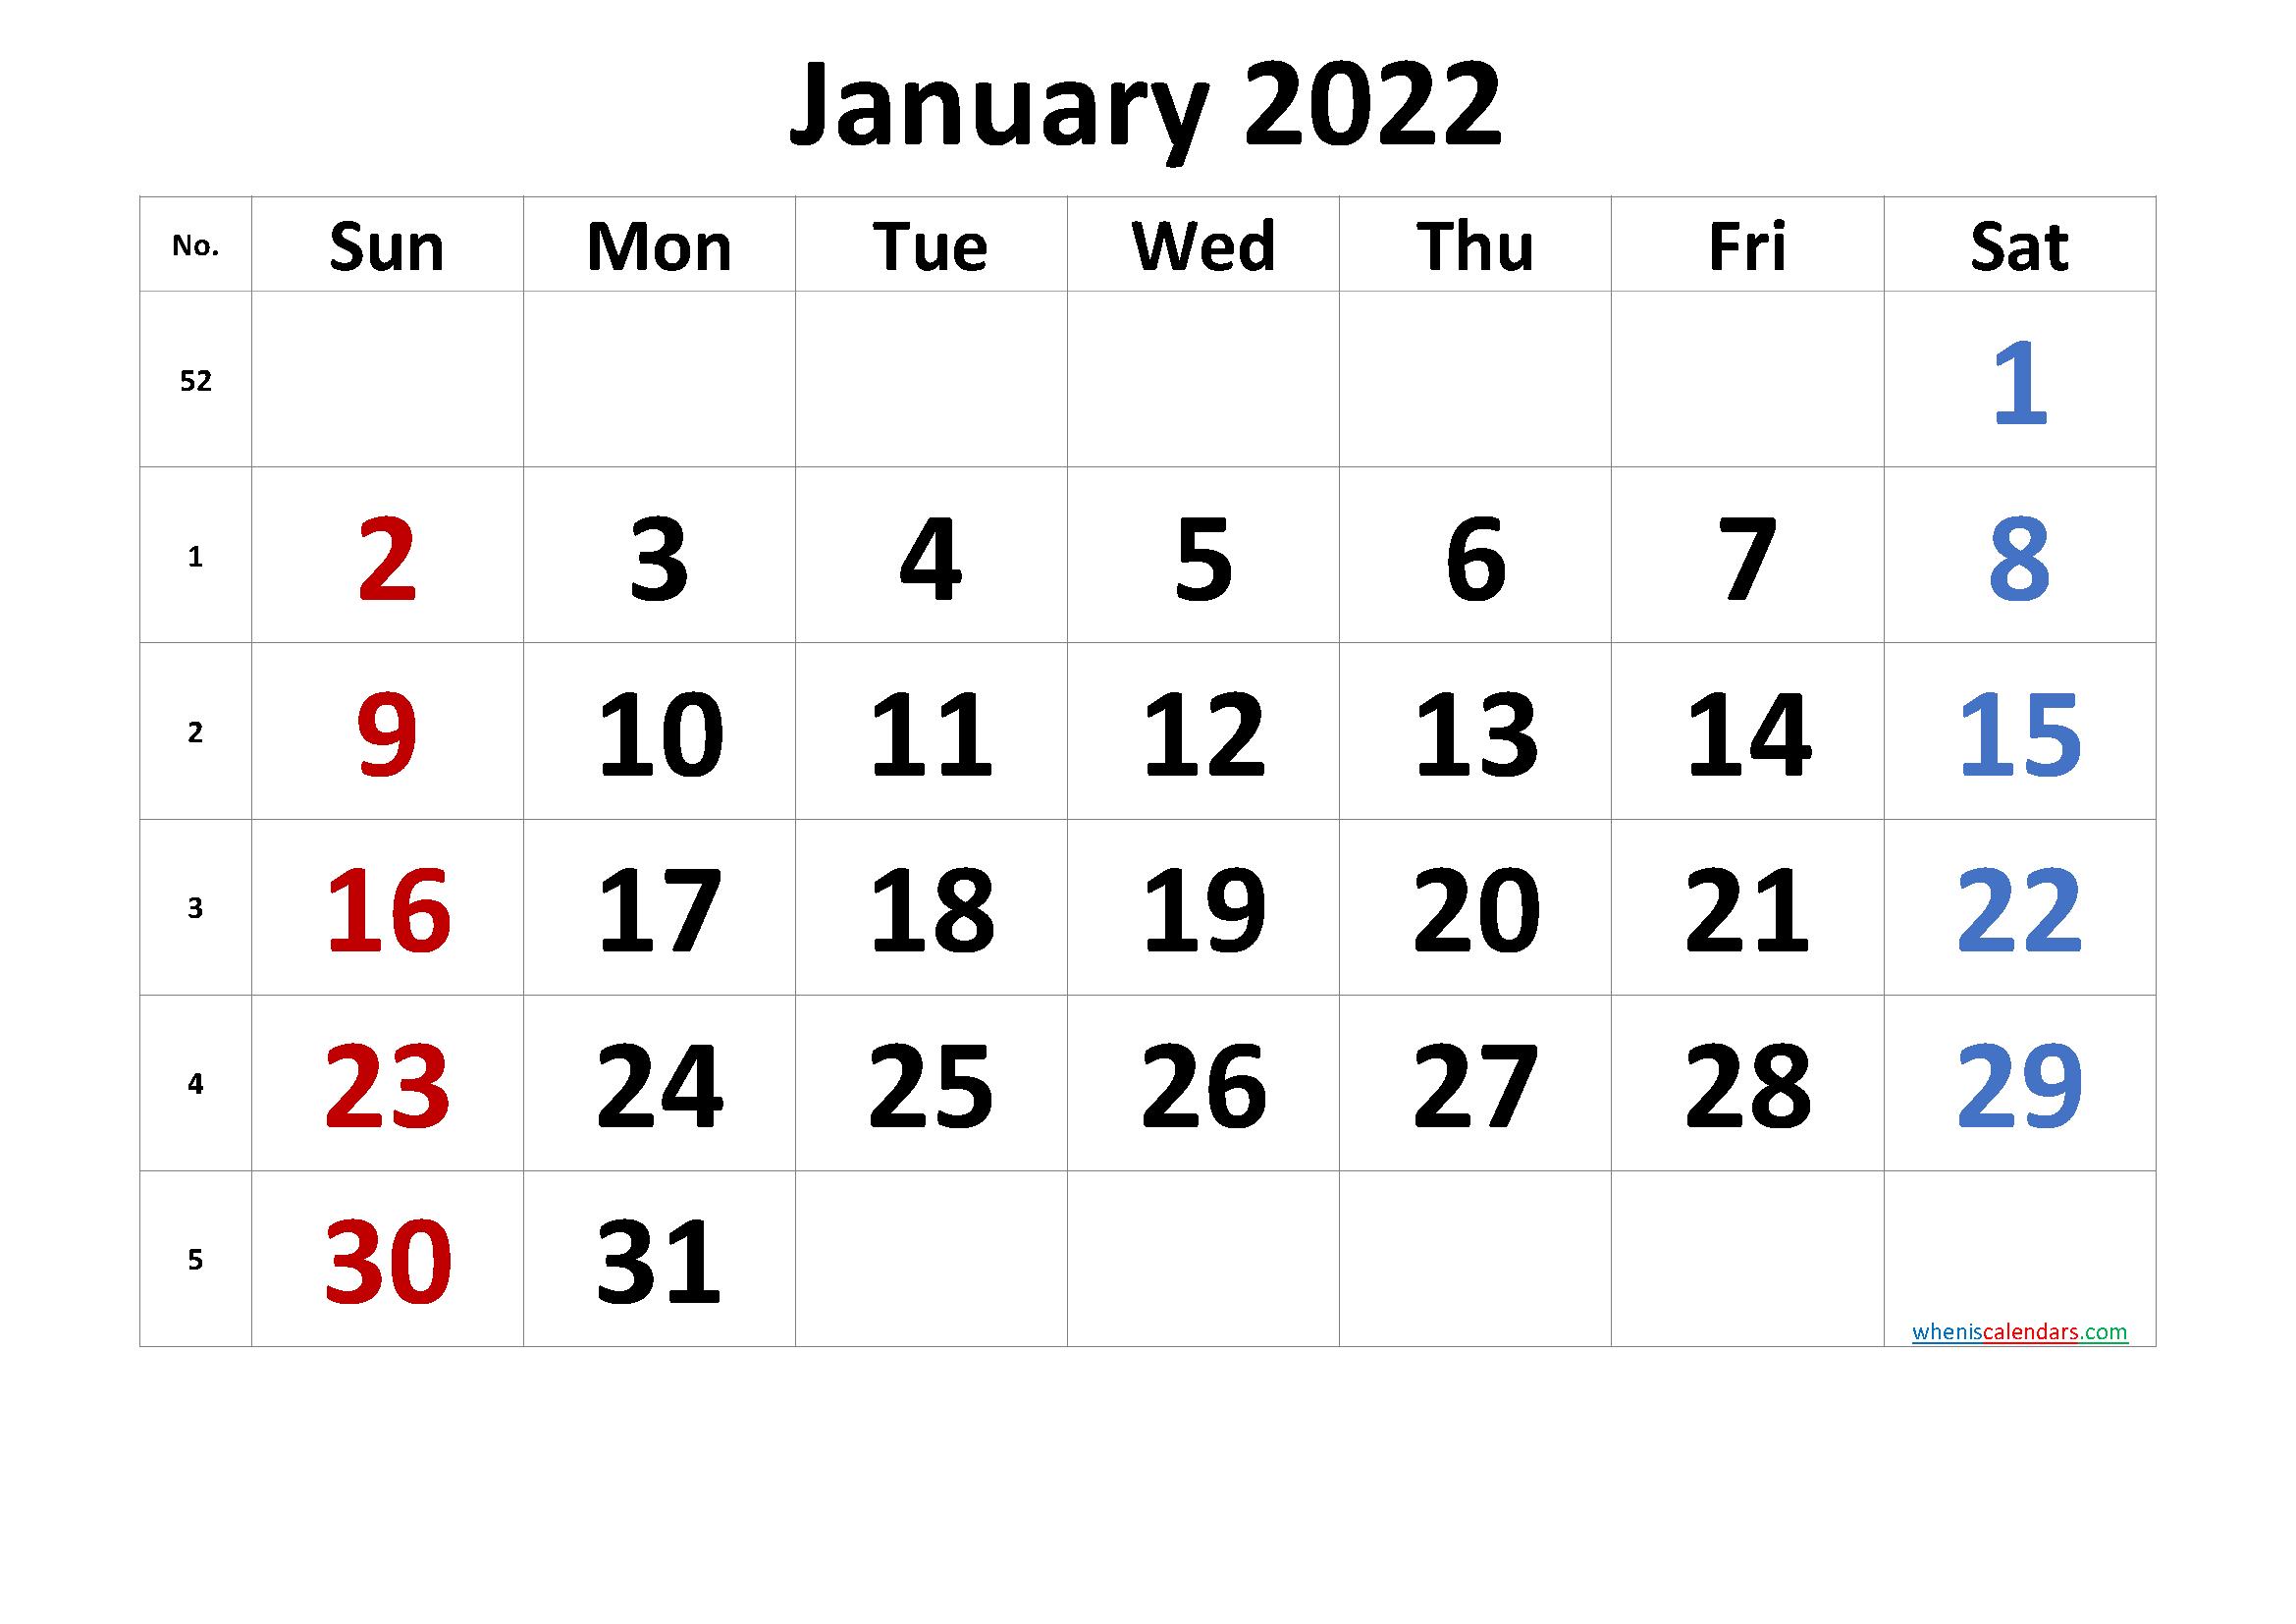 Free January 2022 Calendar with Week Numbers